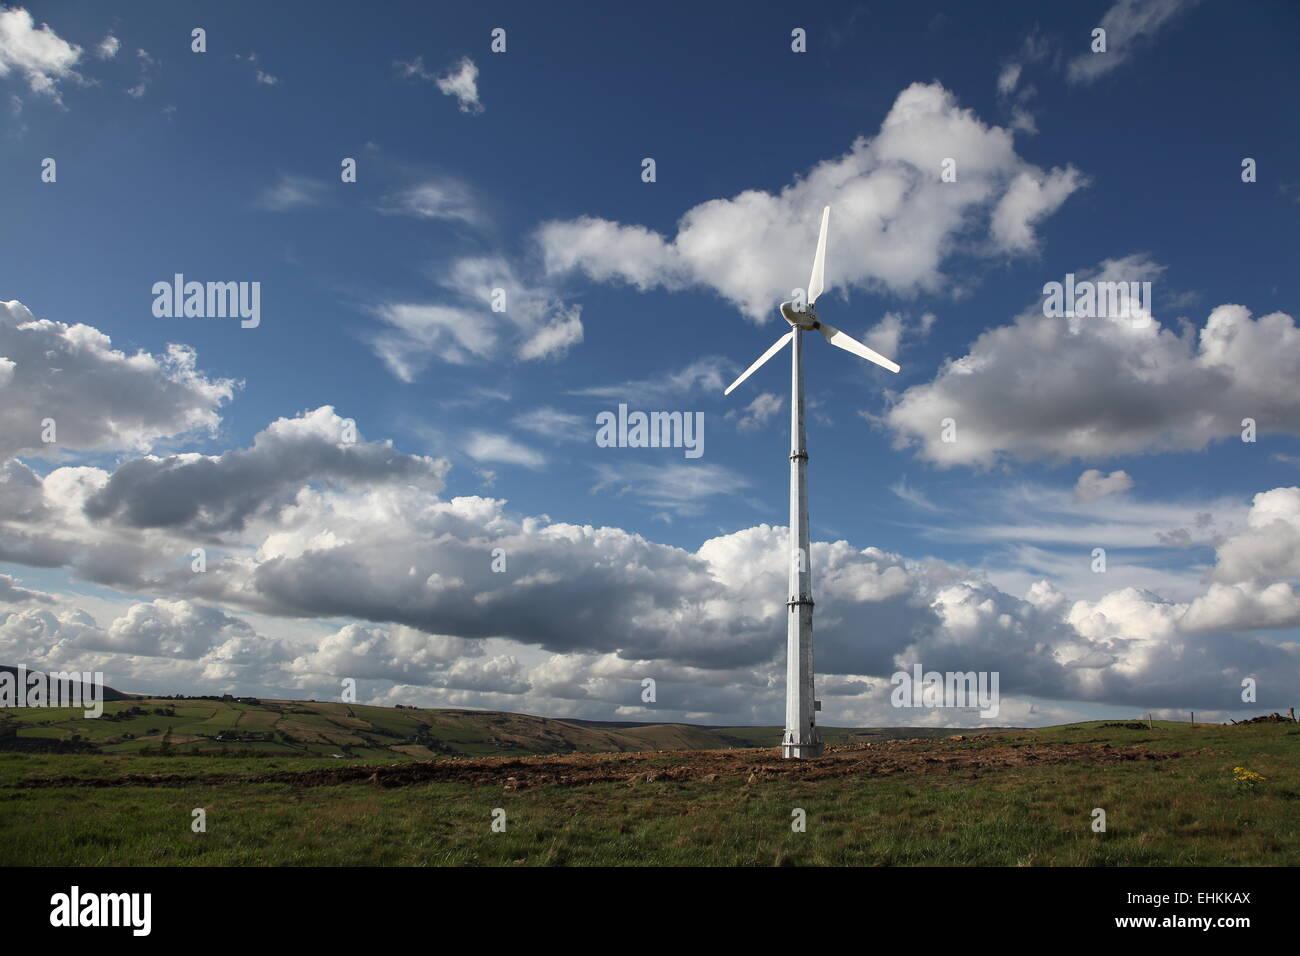 a-wind-turbine-in-the-pennine-foothills-above-dobcross-oldham-uk-EHKKAX.jpg